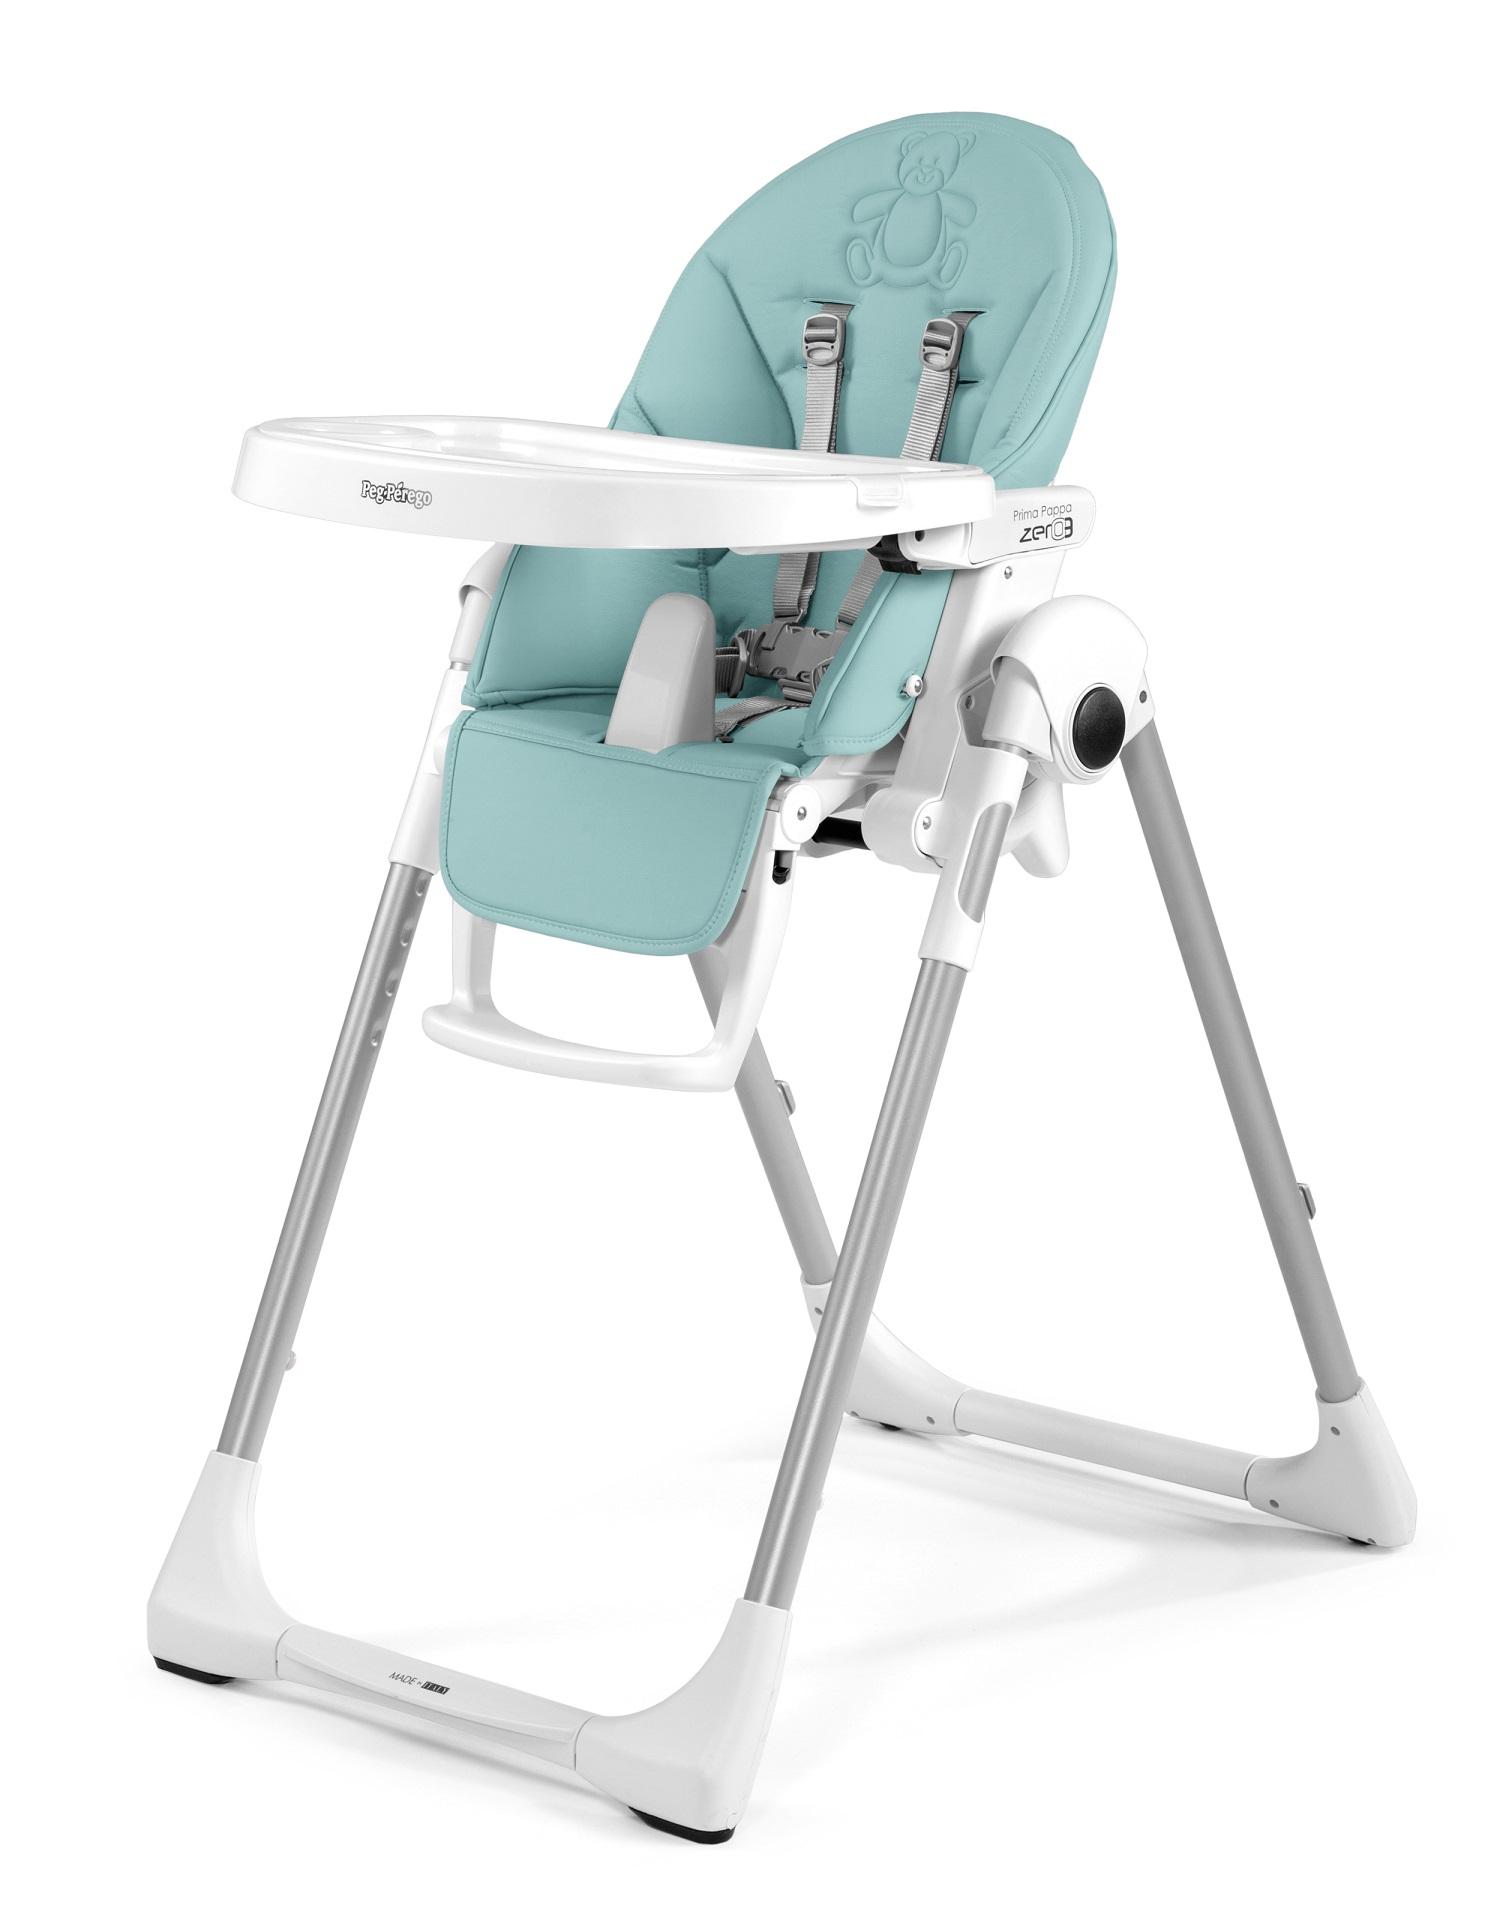 Peg perego high chair prima pappa zero3 2018 bear azul - Chaise haute peg perego siesta ...